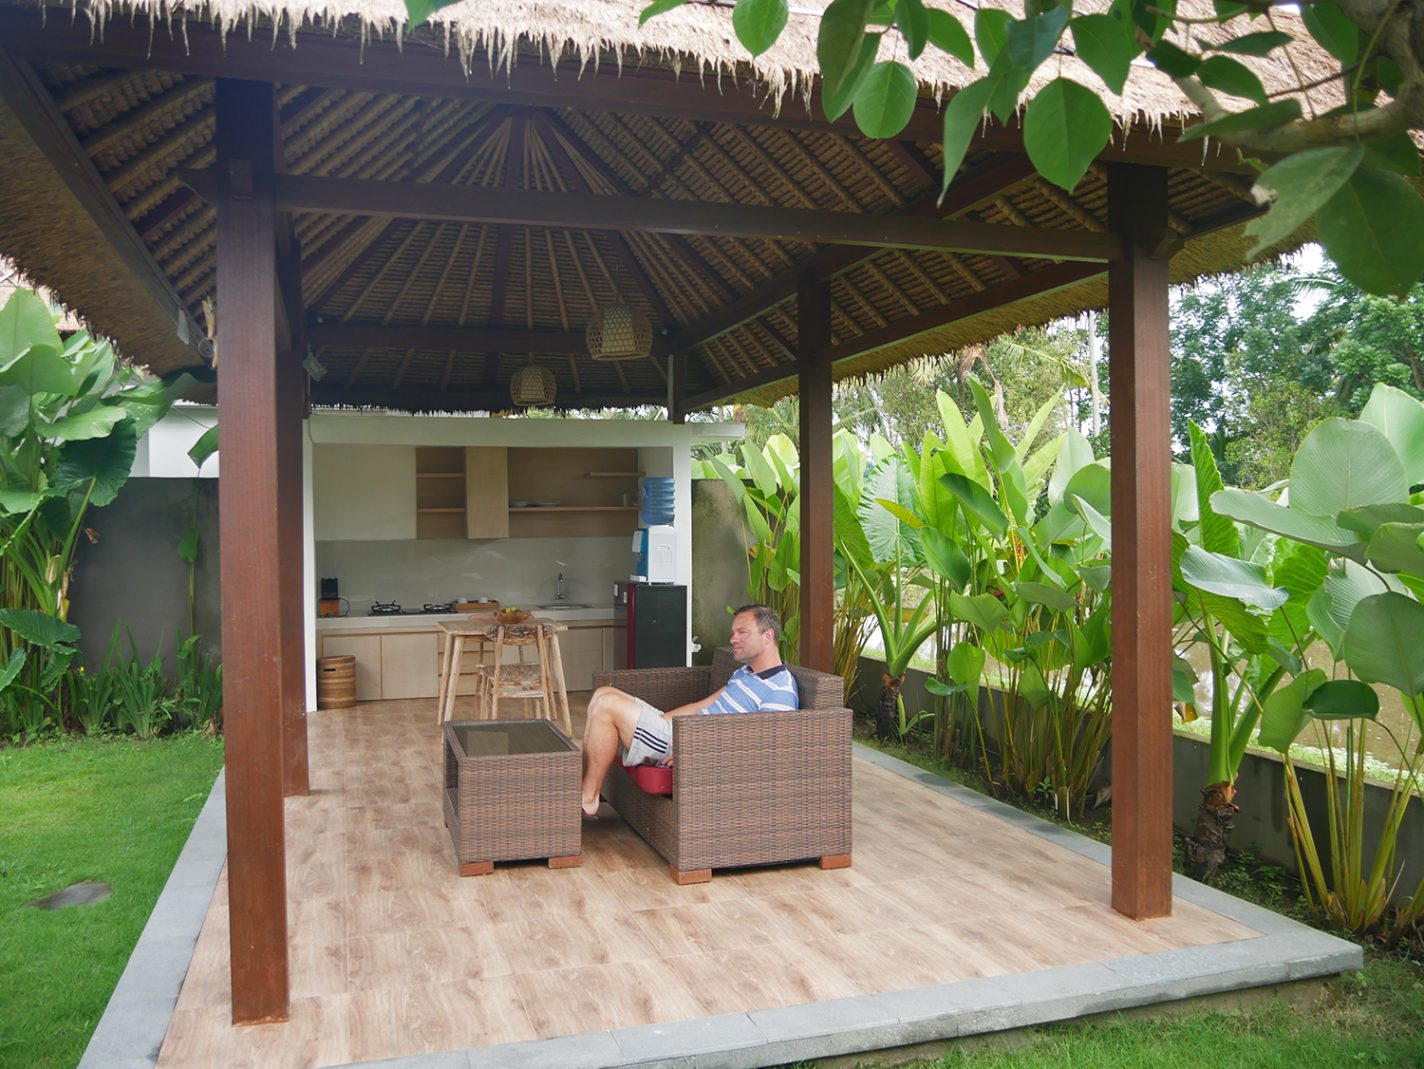 Groot terras met keuken en loungeset